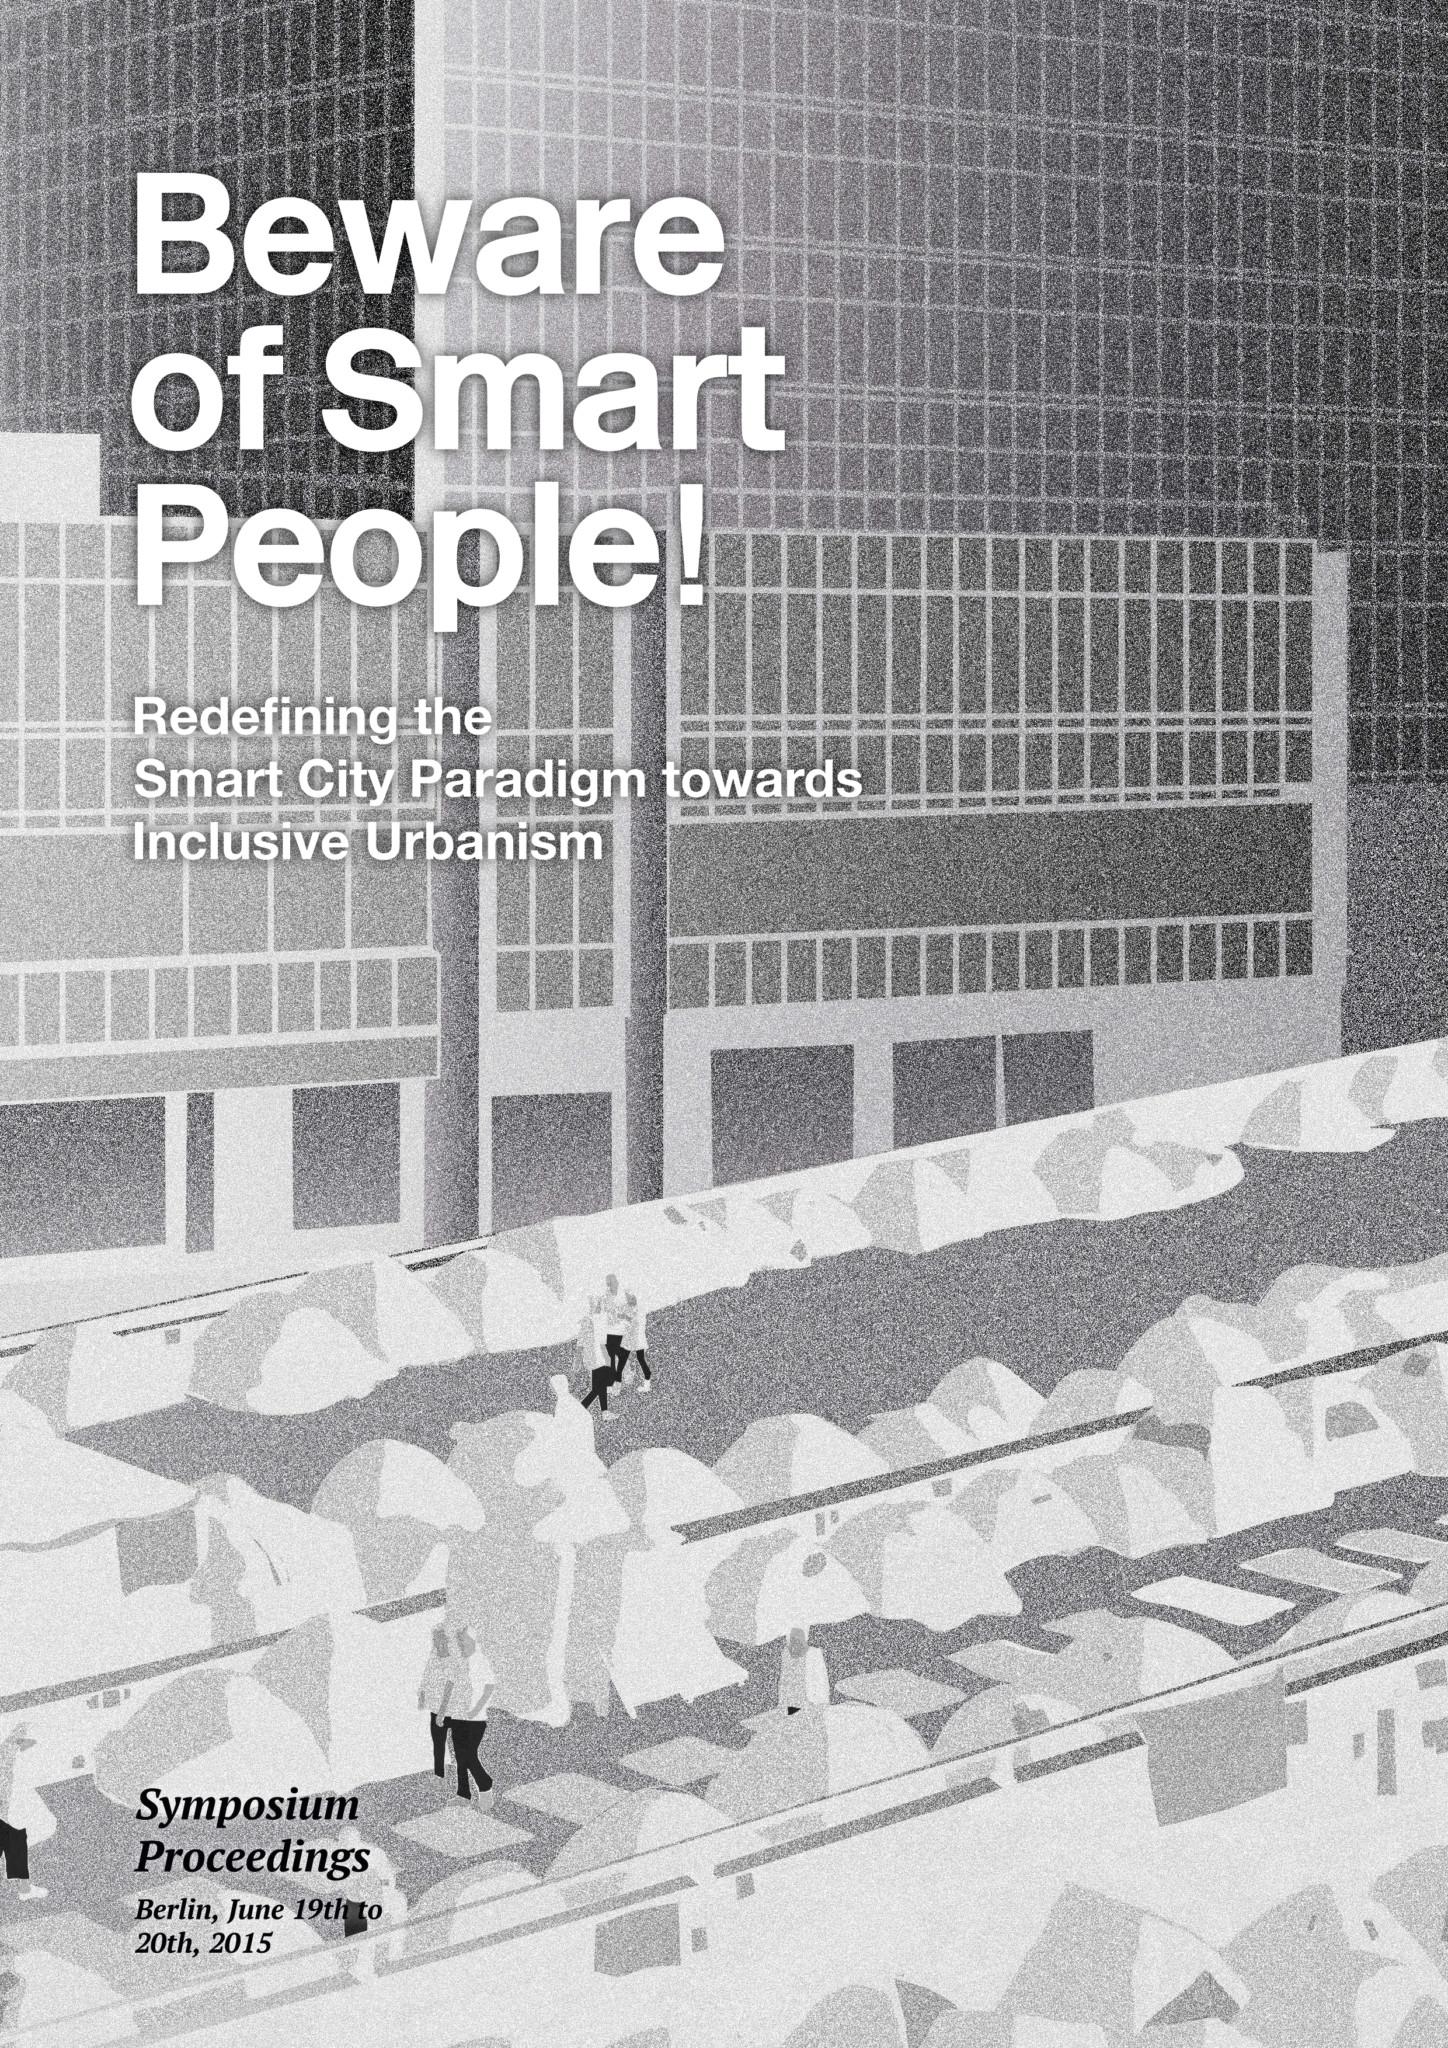 beware of smart people